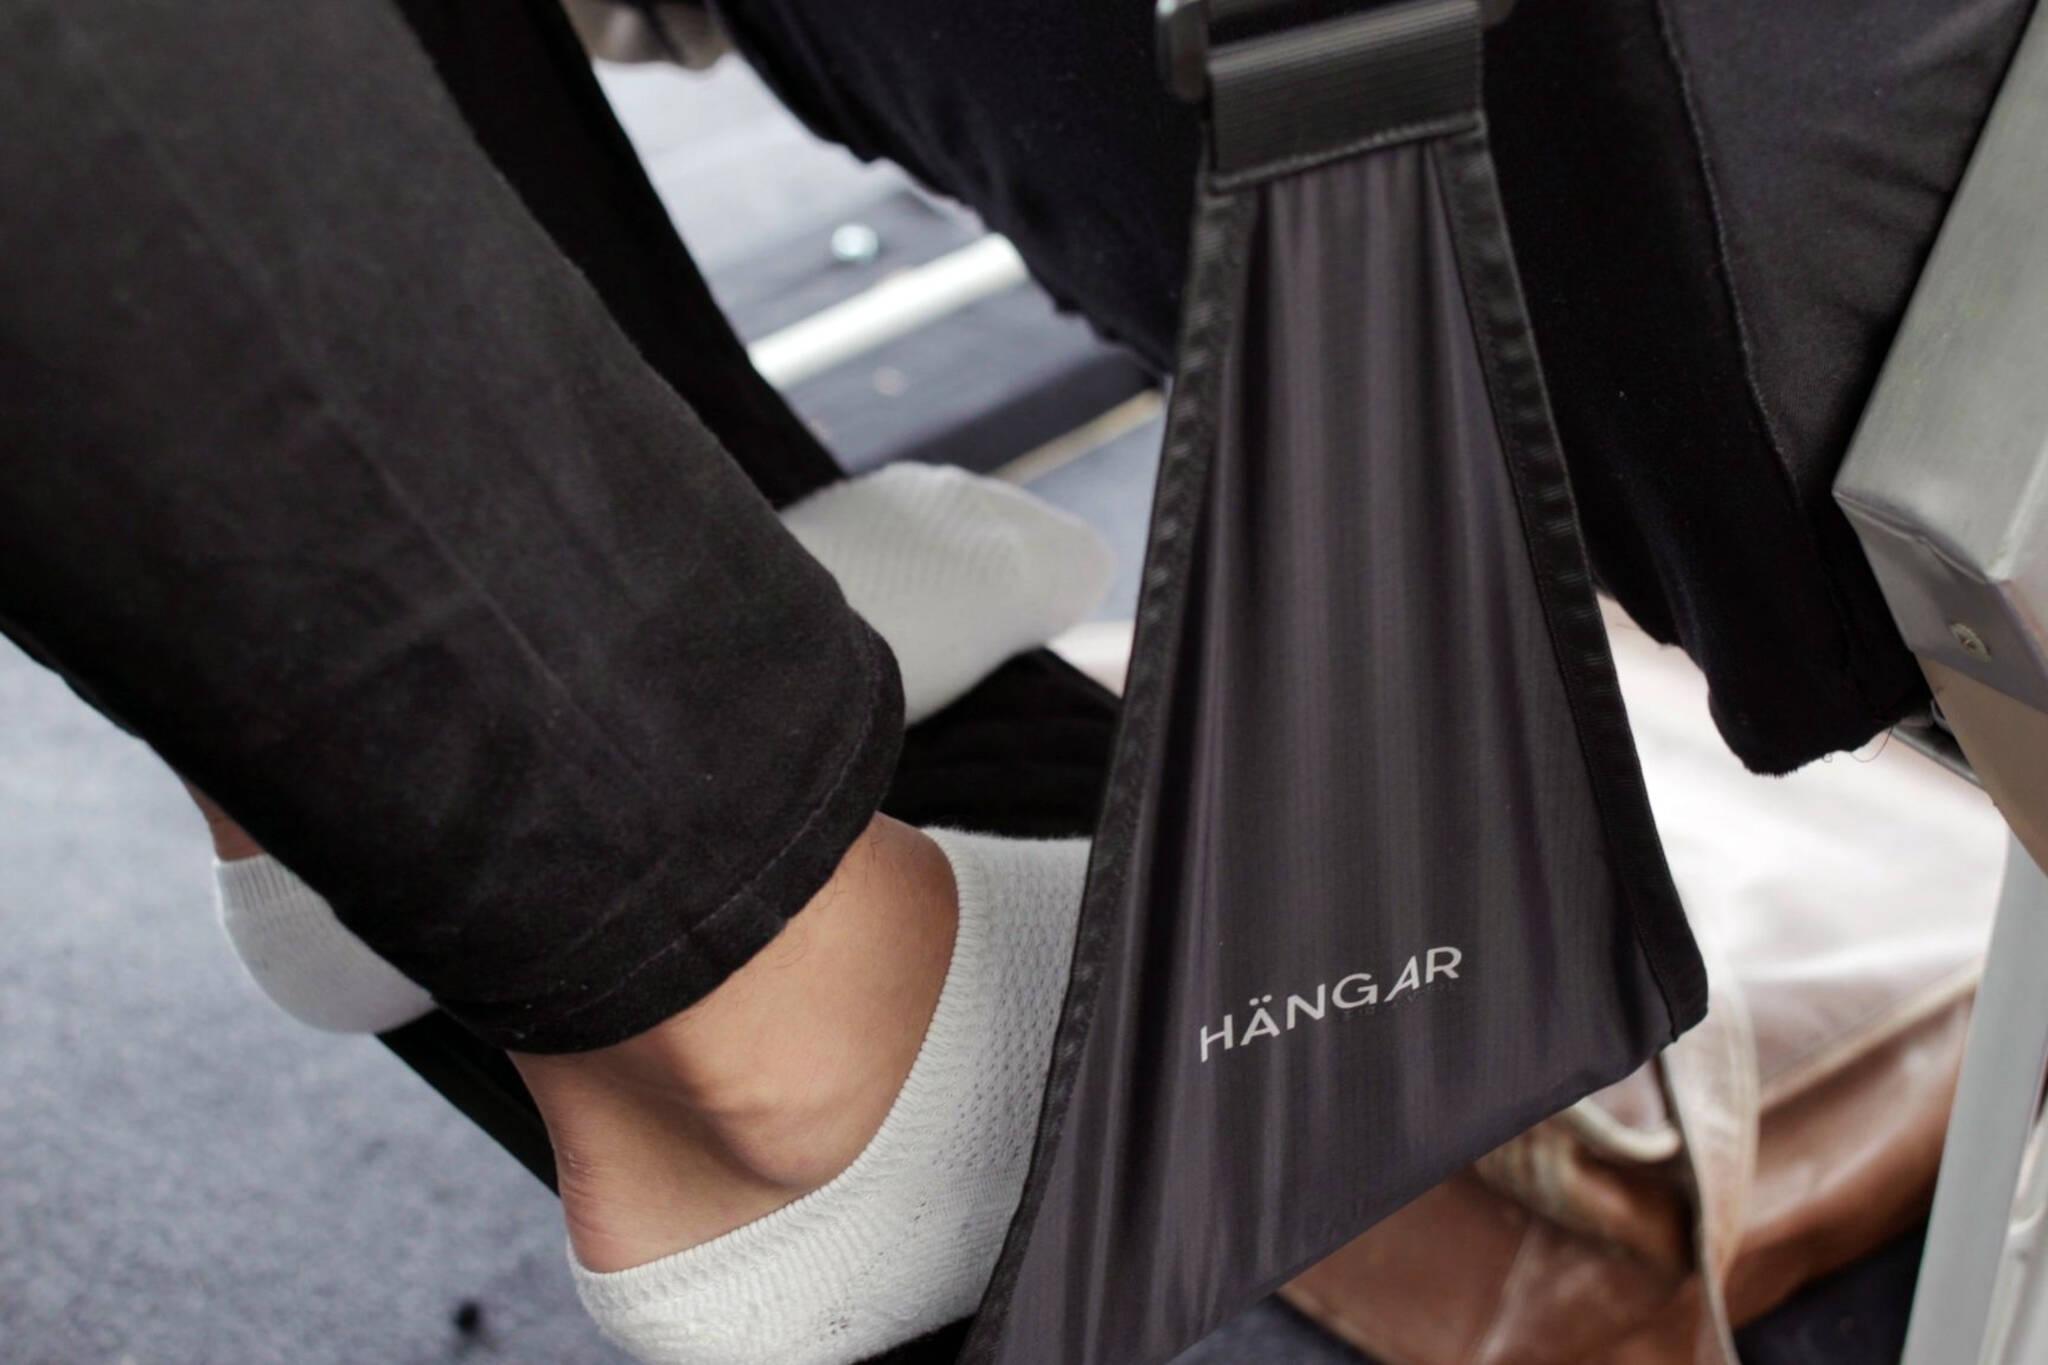 Hangar foot rest